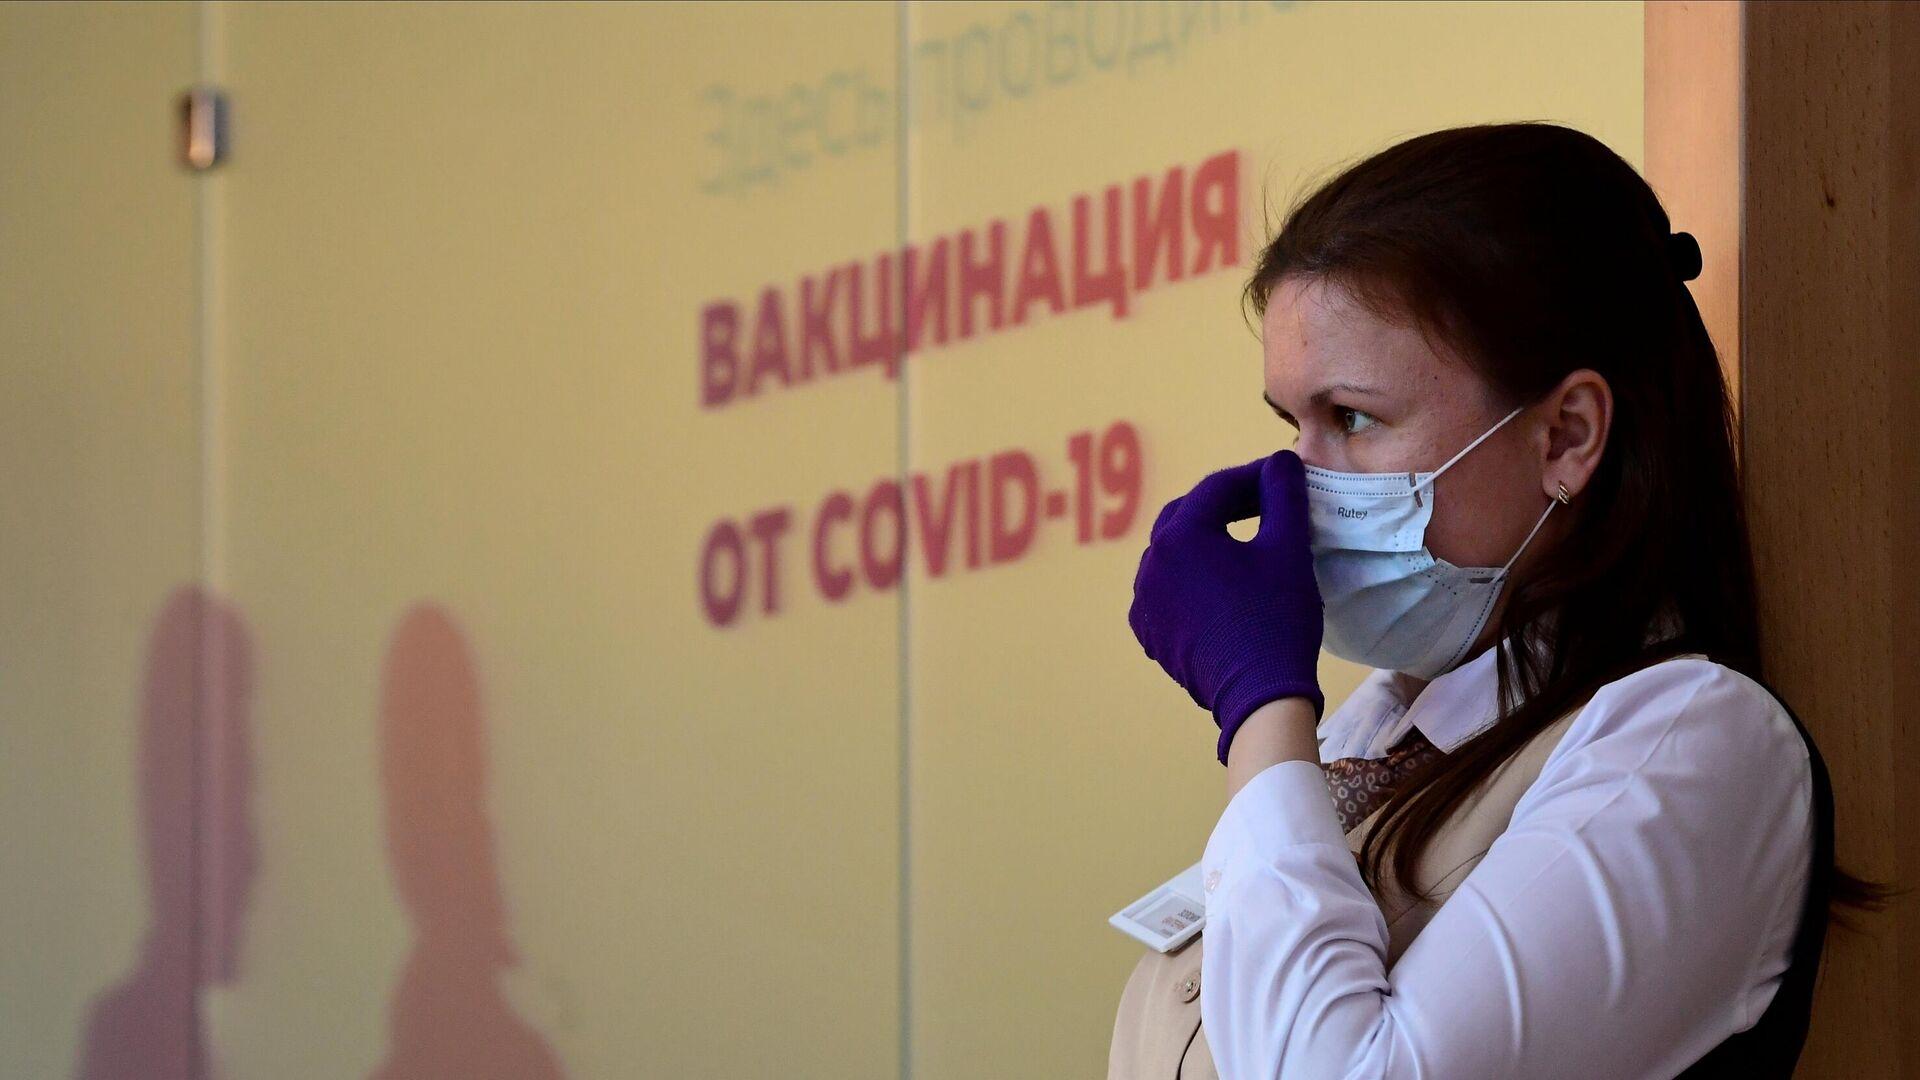 Сотрудница центра госуслуг Мои документы возле пункта вакцинации от COVID-19 - РИА Новости, 1920, 15.03.2021